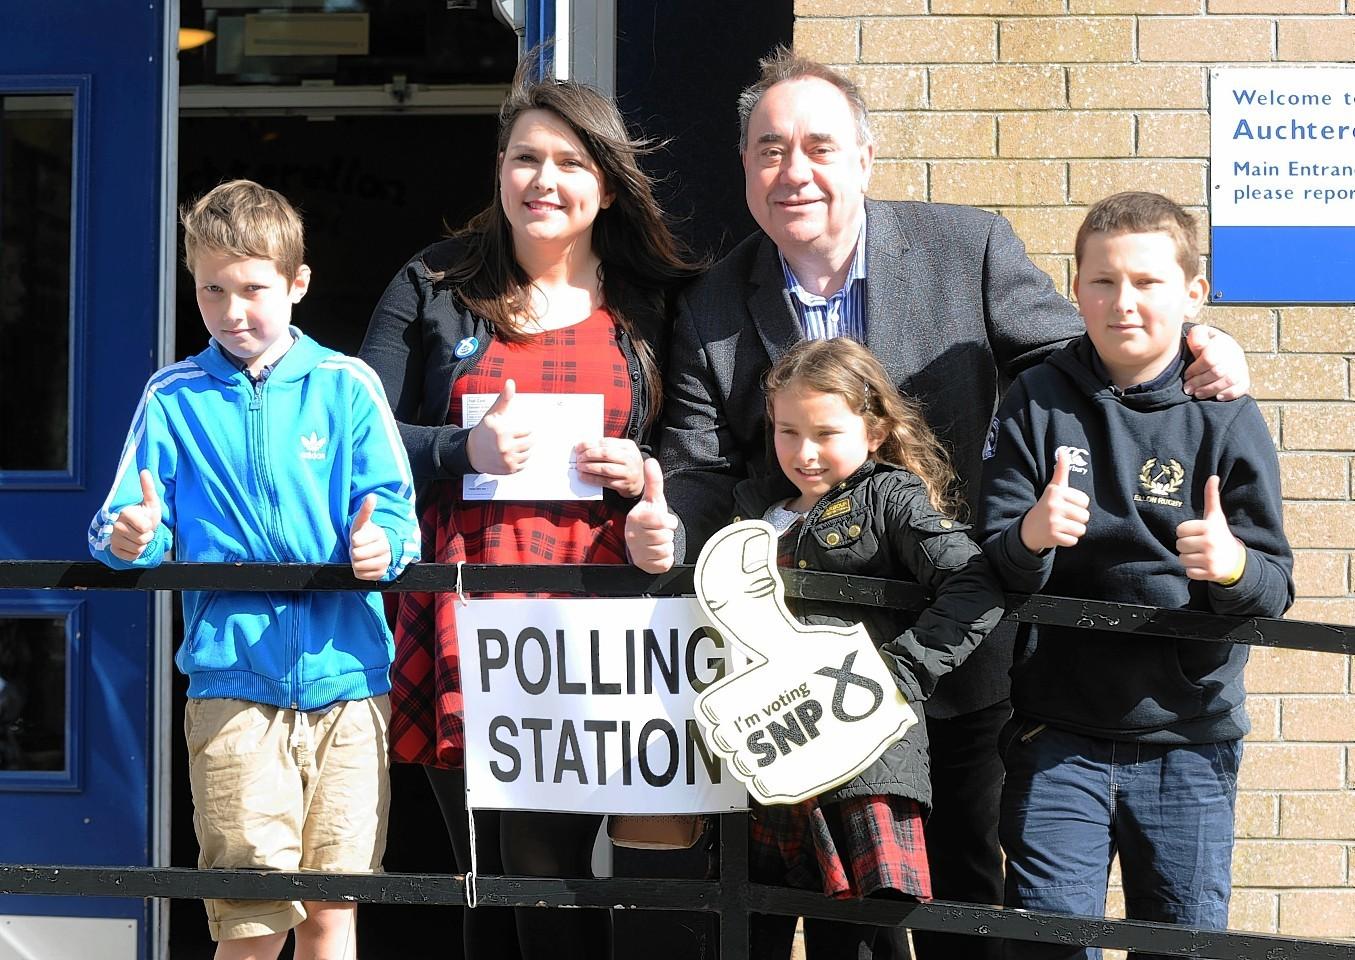 Gordon SNP candidate Alex Salmond visited Auchterellon School to vote with first-time-voter Nikki Falconer.